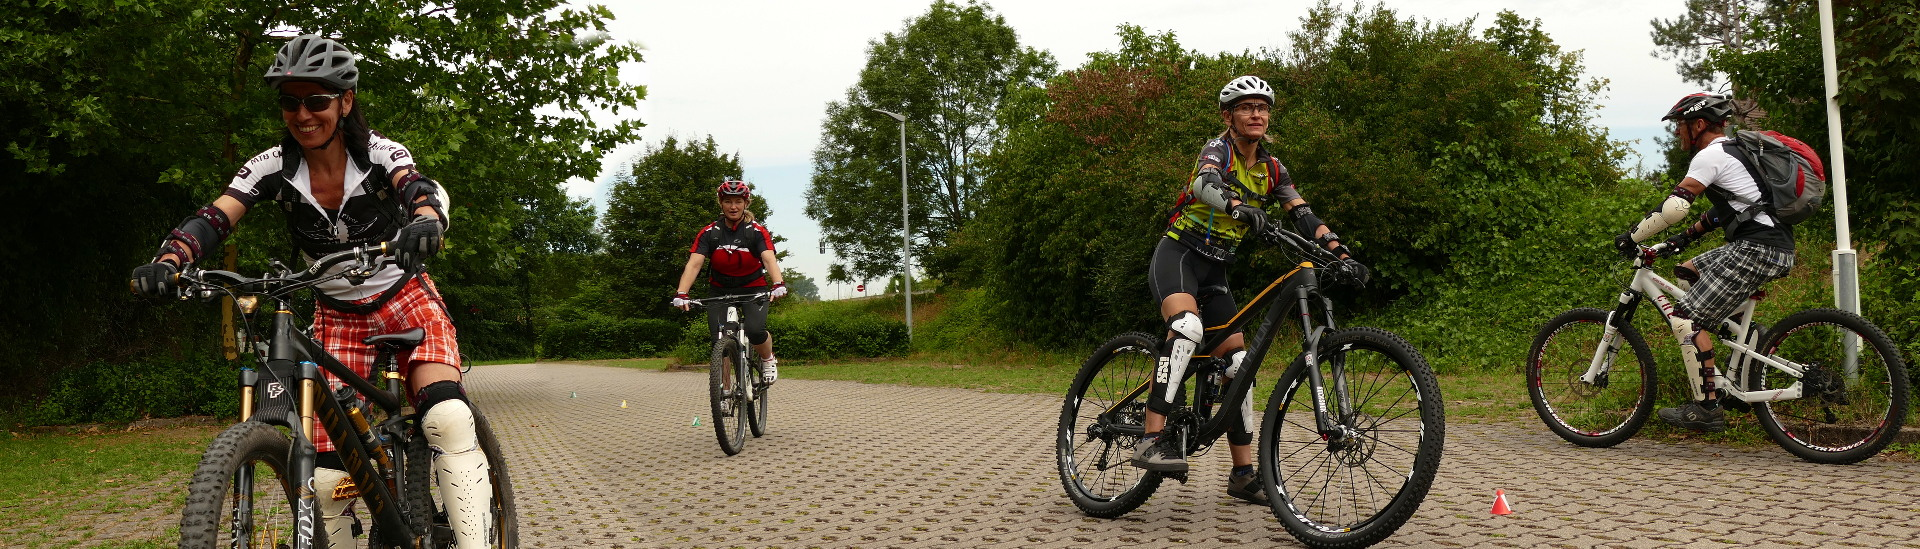 MTB Fahrtechnik Aufbaukurs - Slalom Fahren